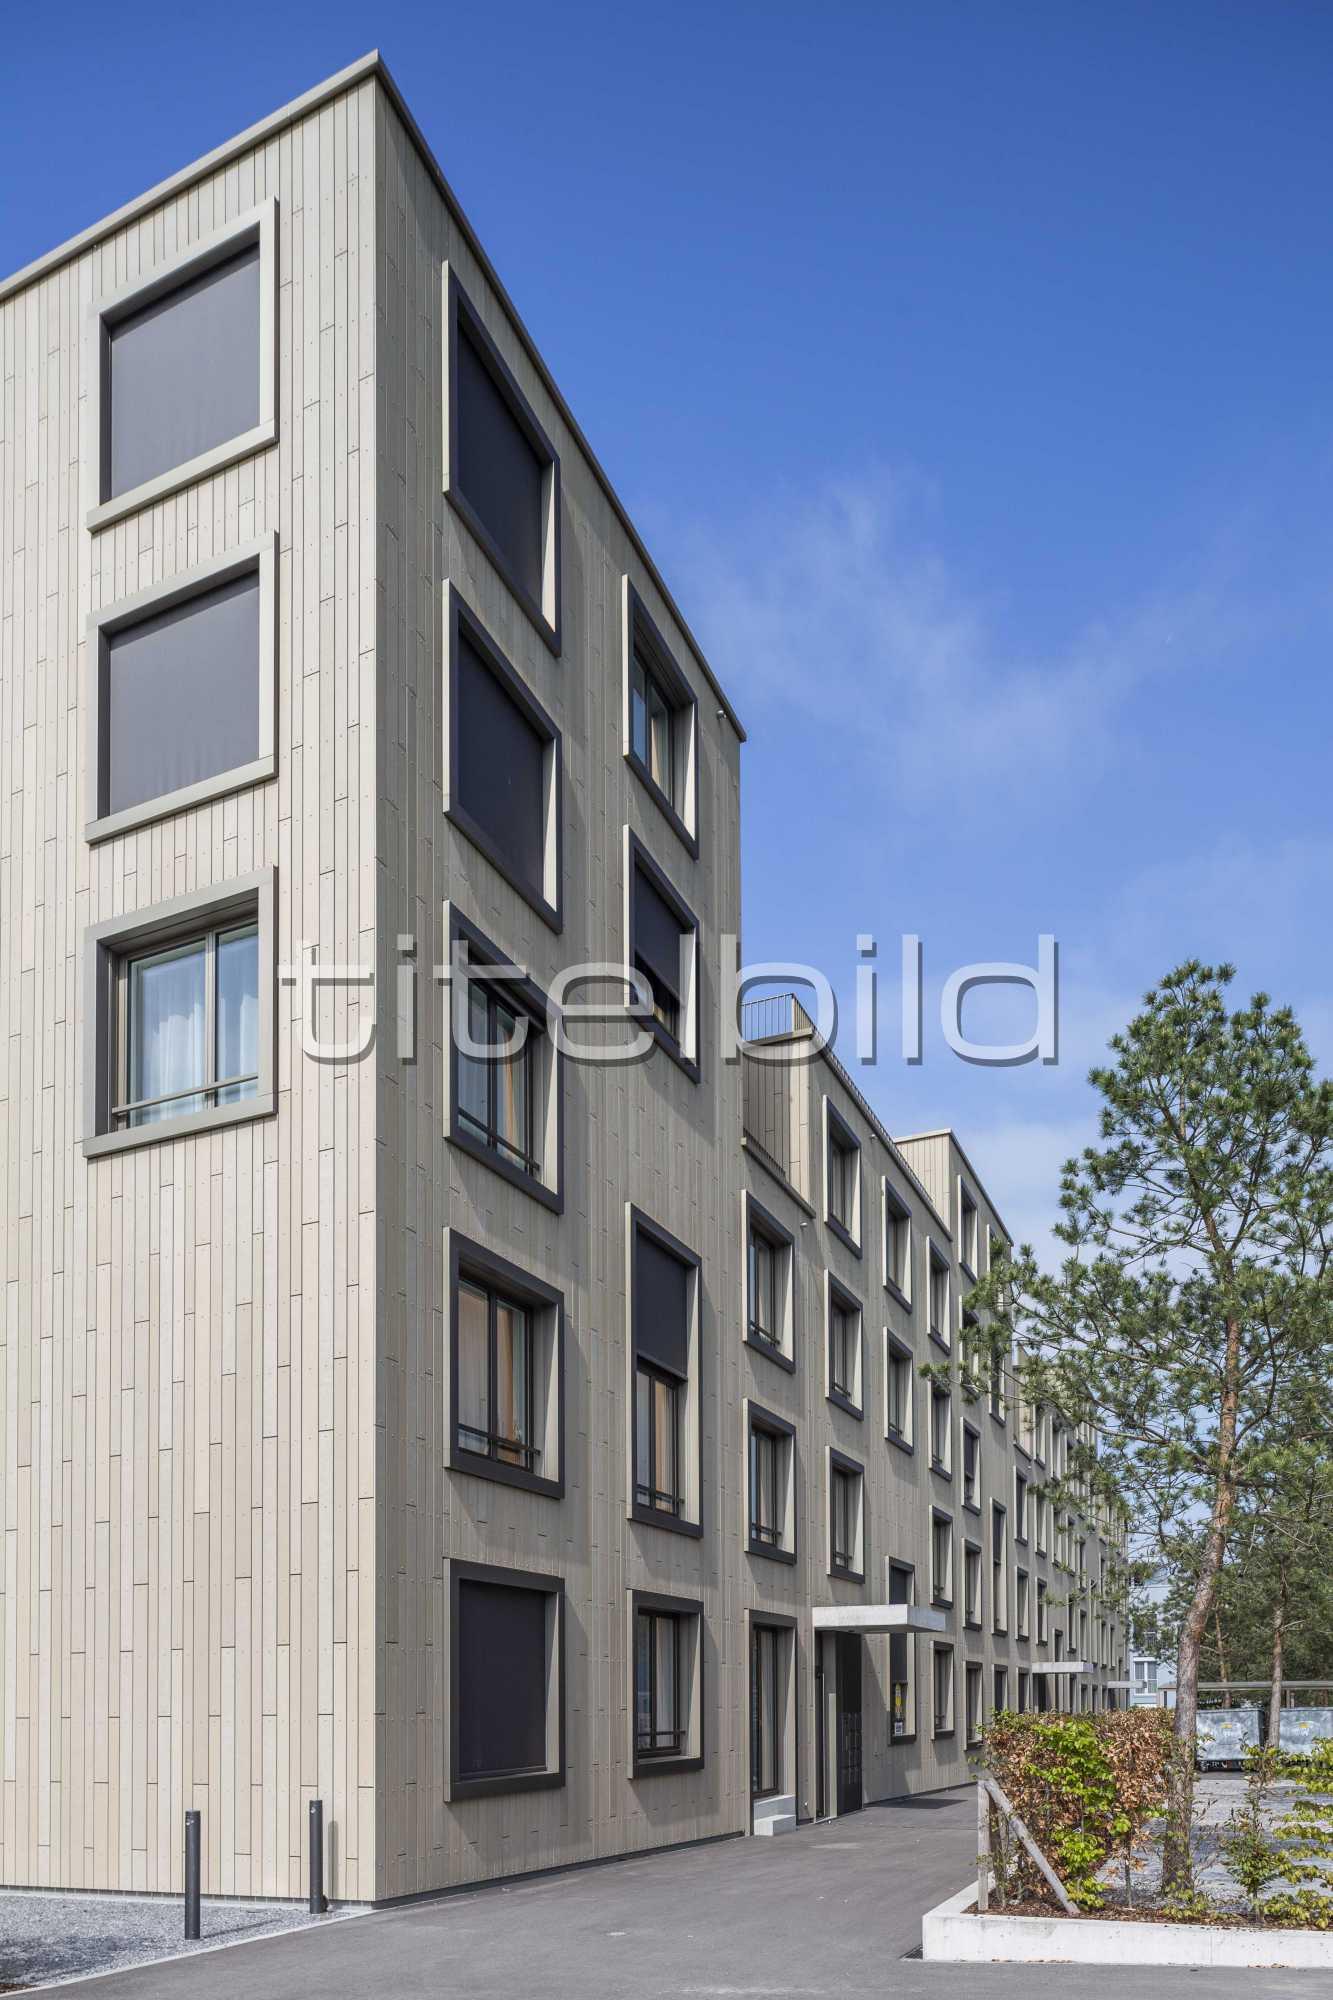 Projektbild-Nr. 1: Wohnsiedlung Neufeld